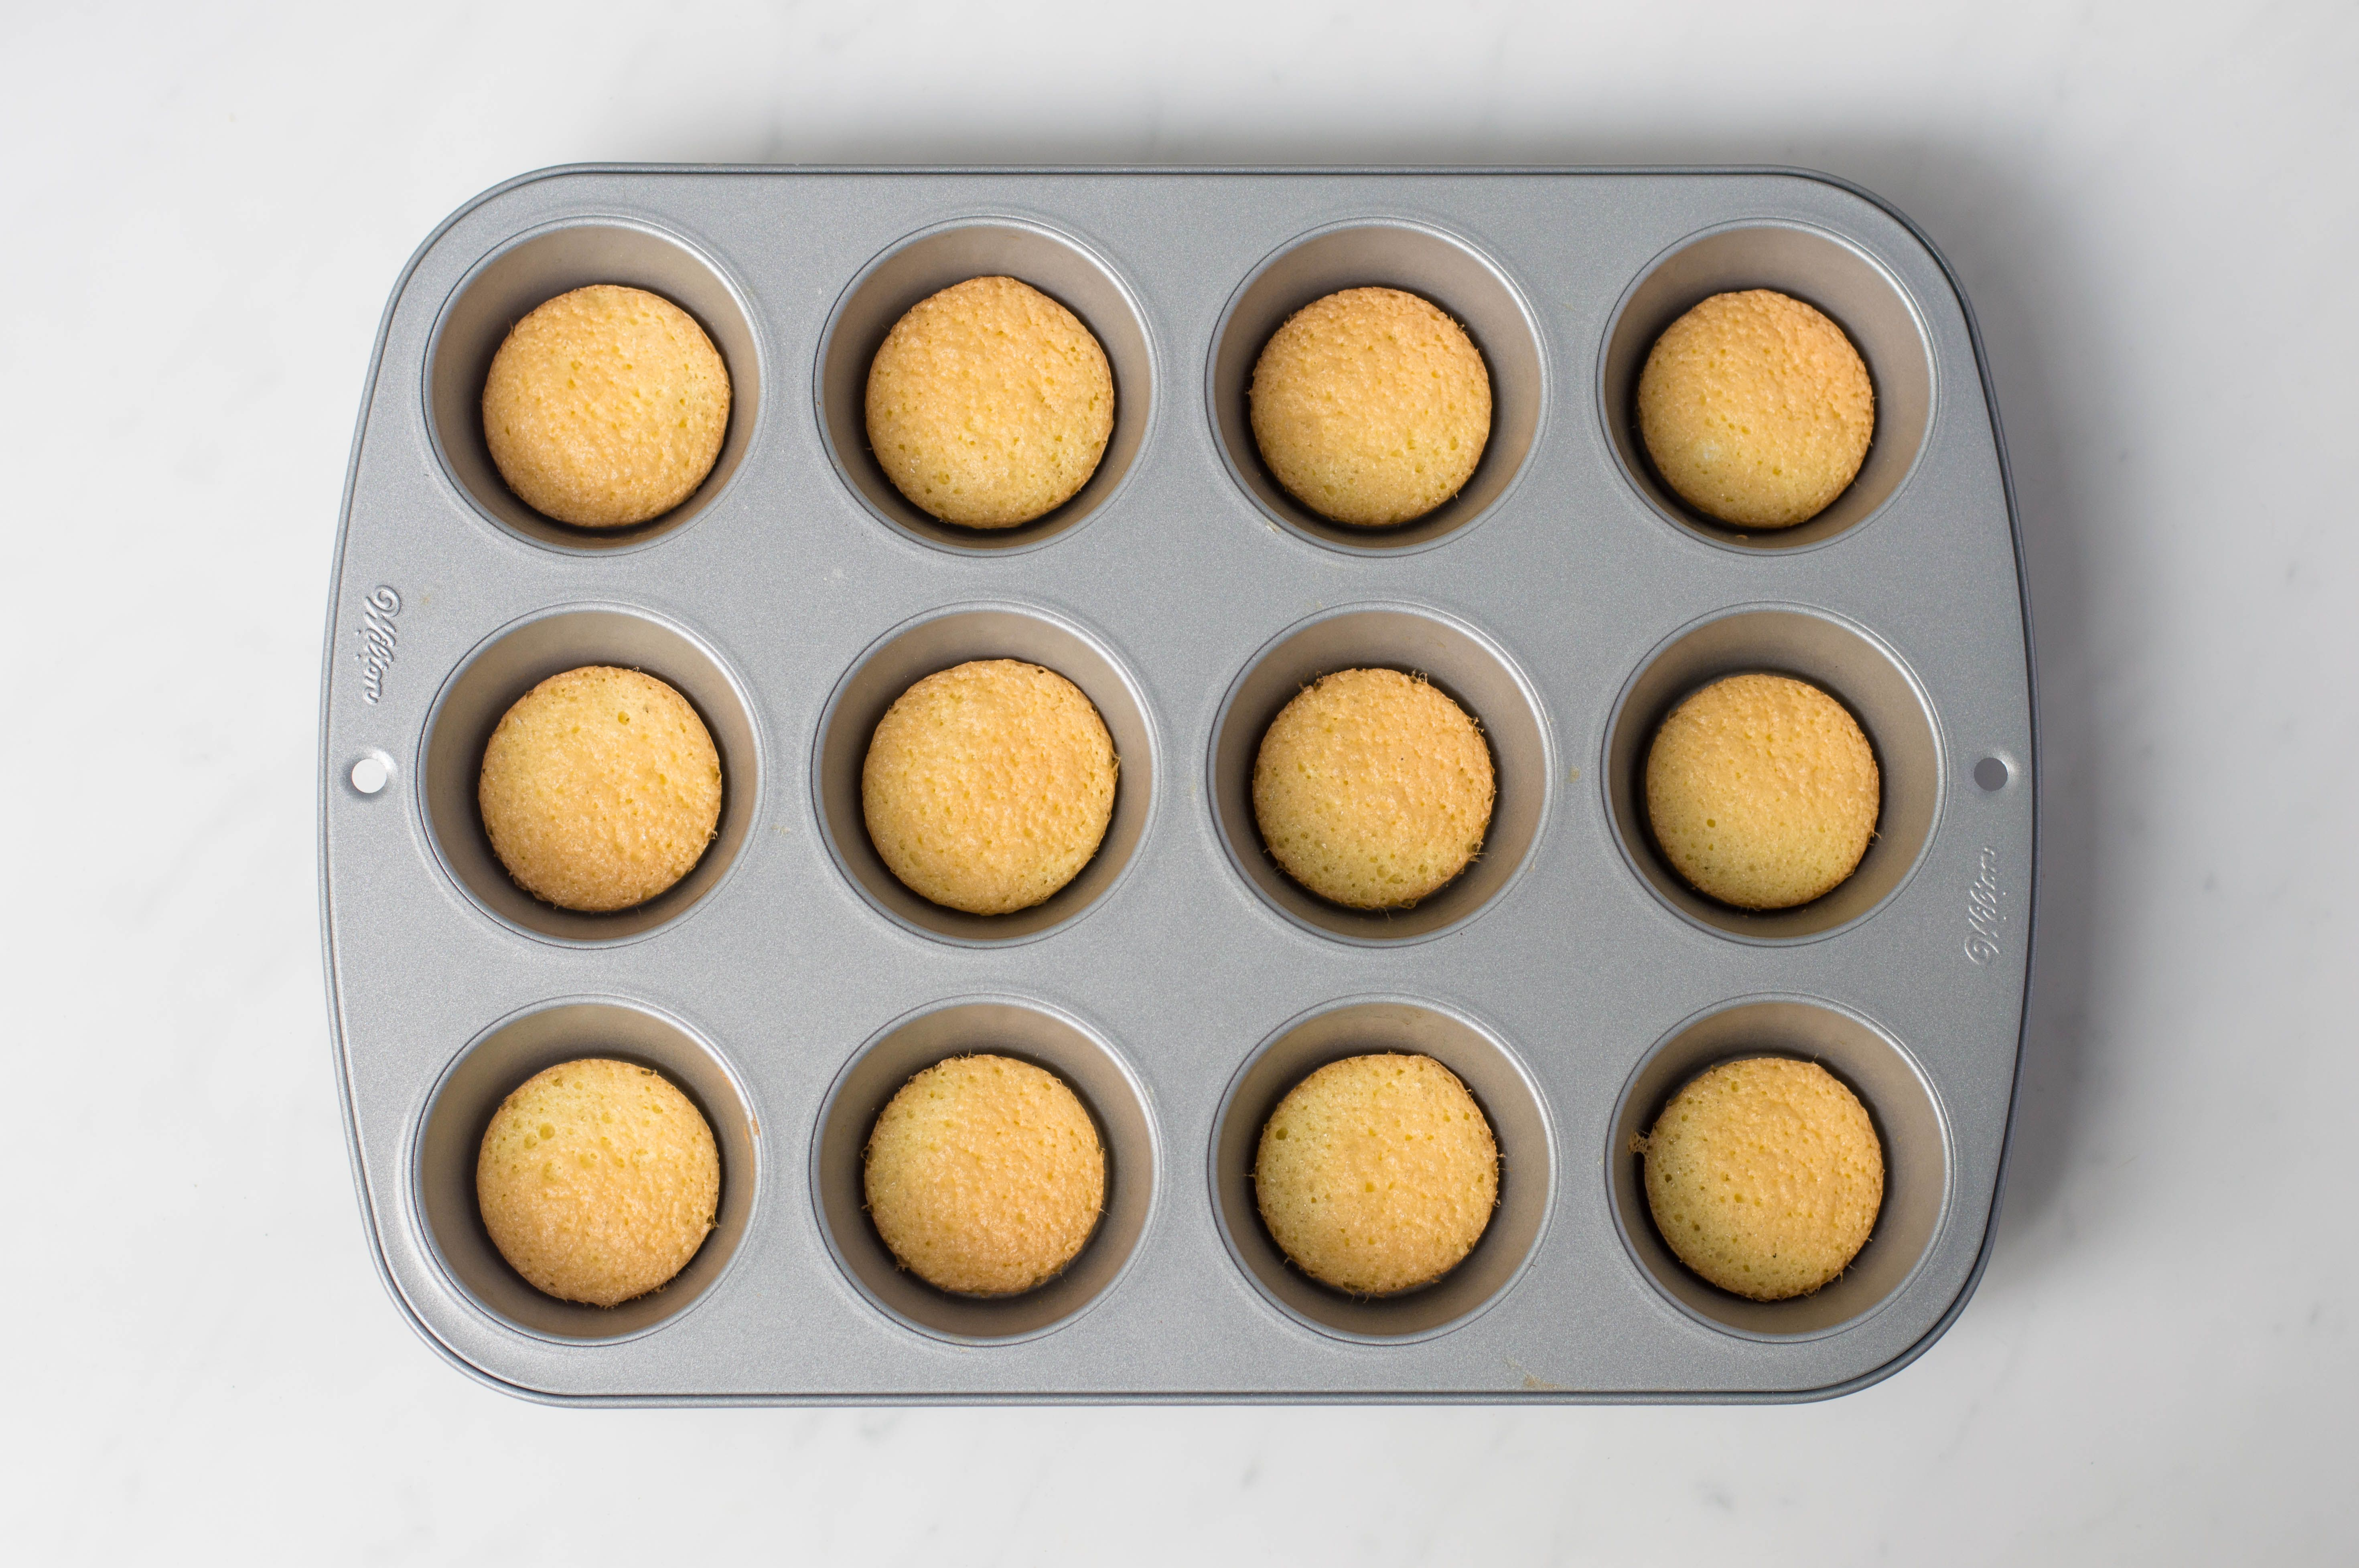 bake jaffa cakes